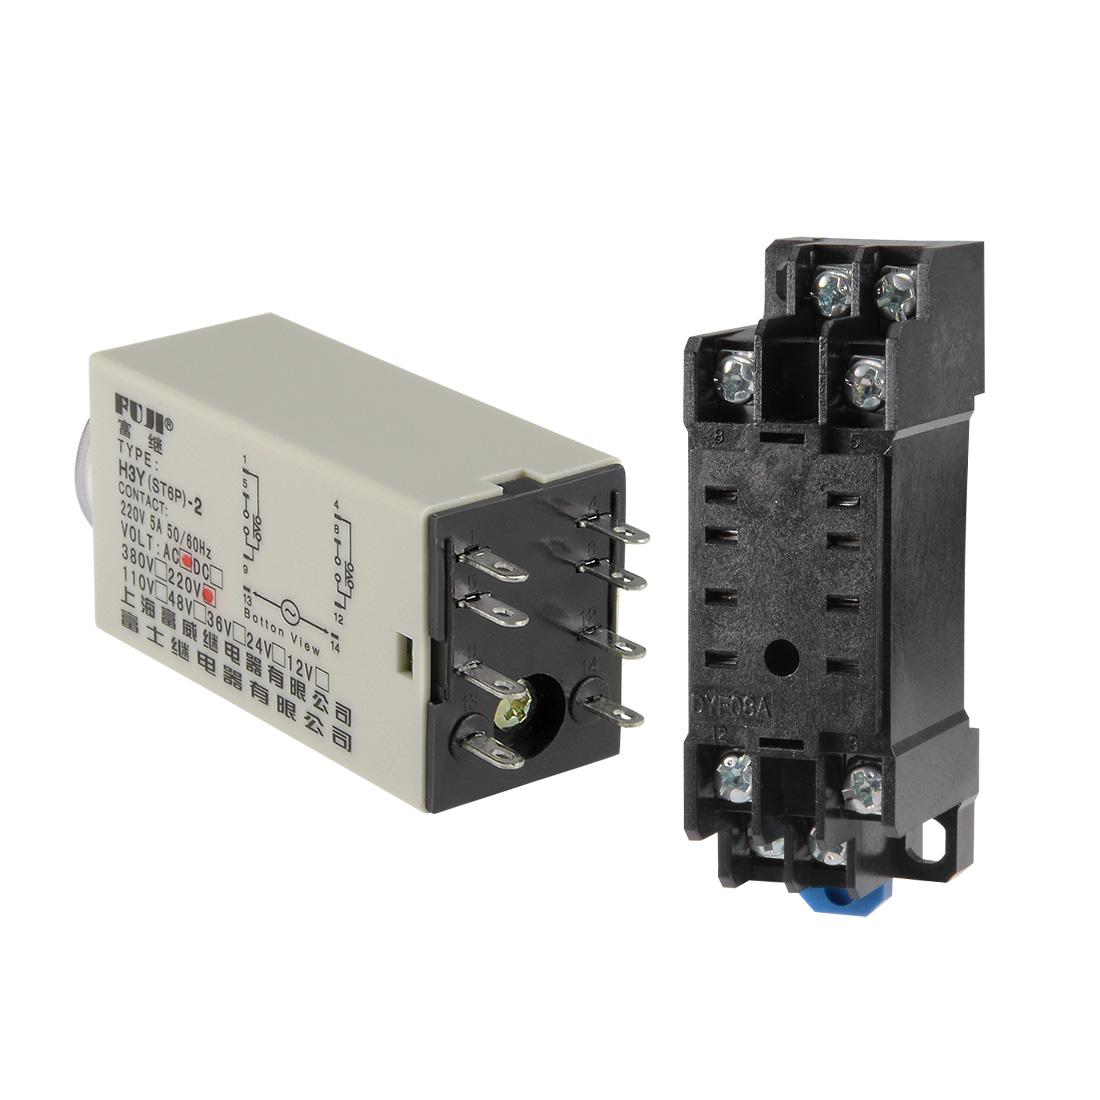 220VAC 60S 8 Terminals Range Adjustable Delay Timer Time Relay H3Y-2 w base - image 4 of 6